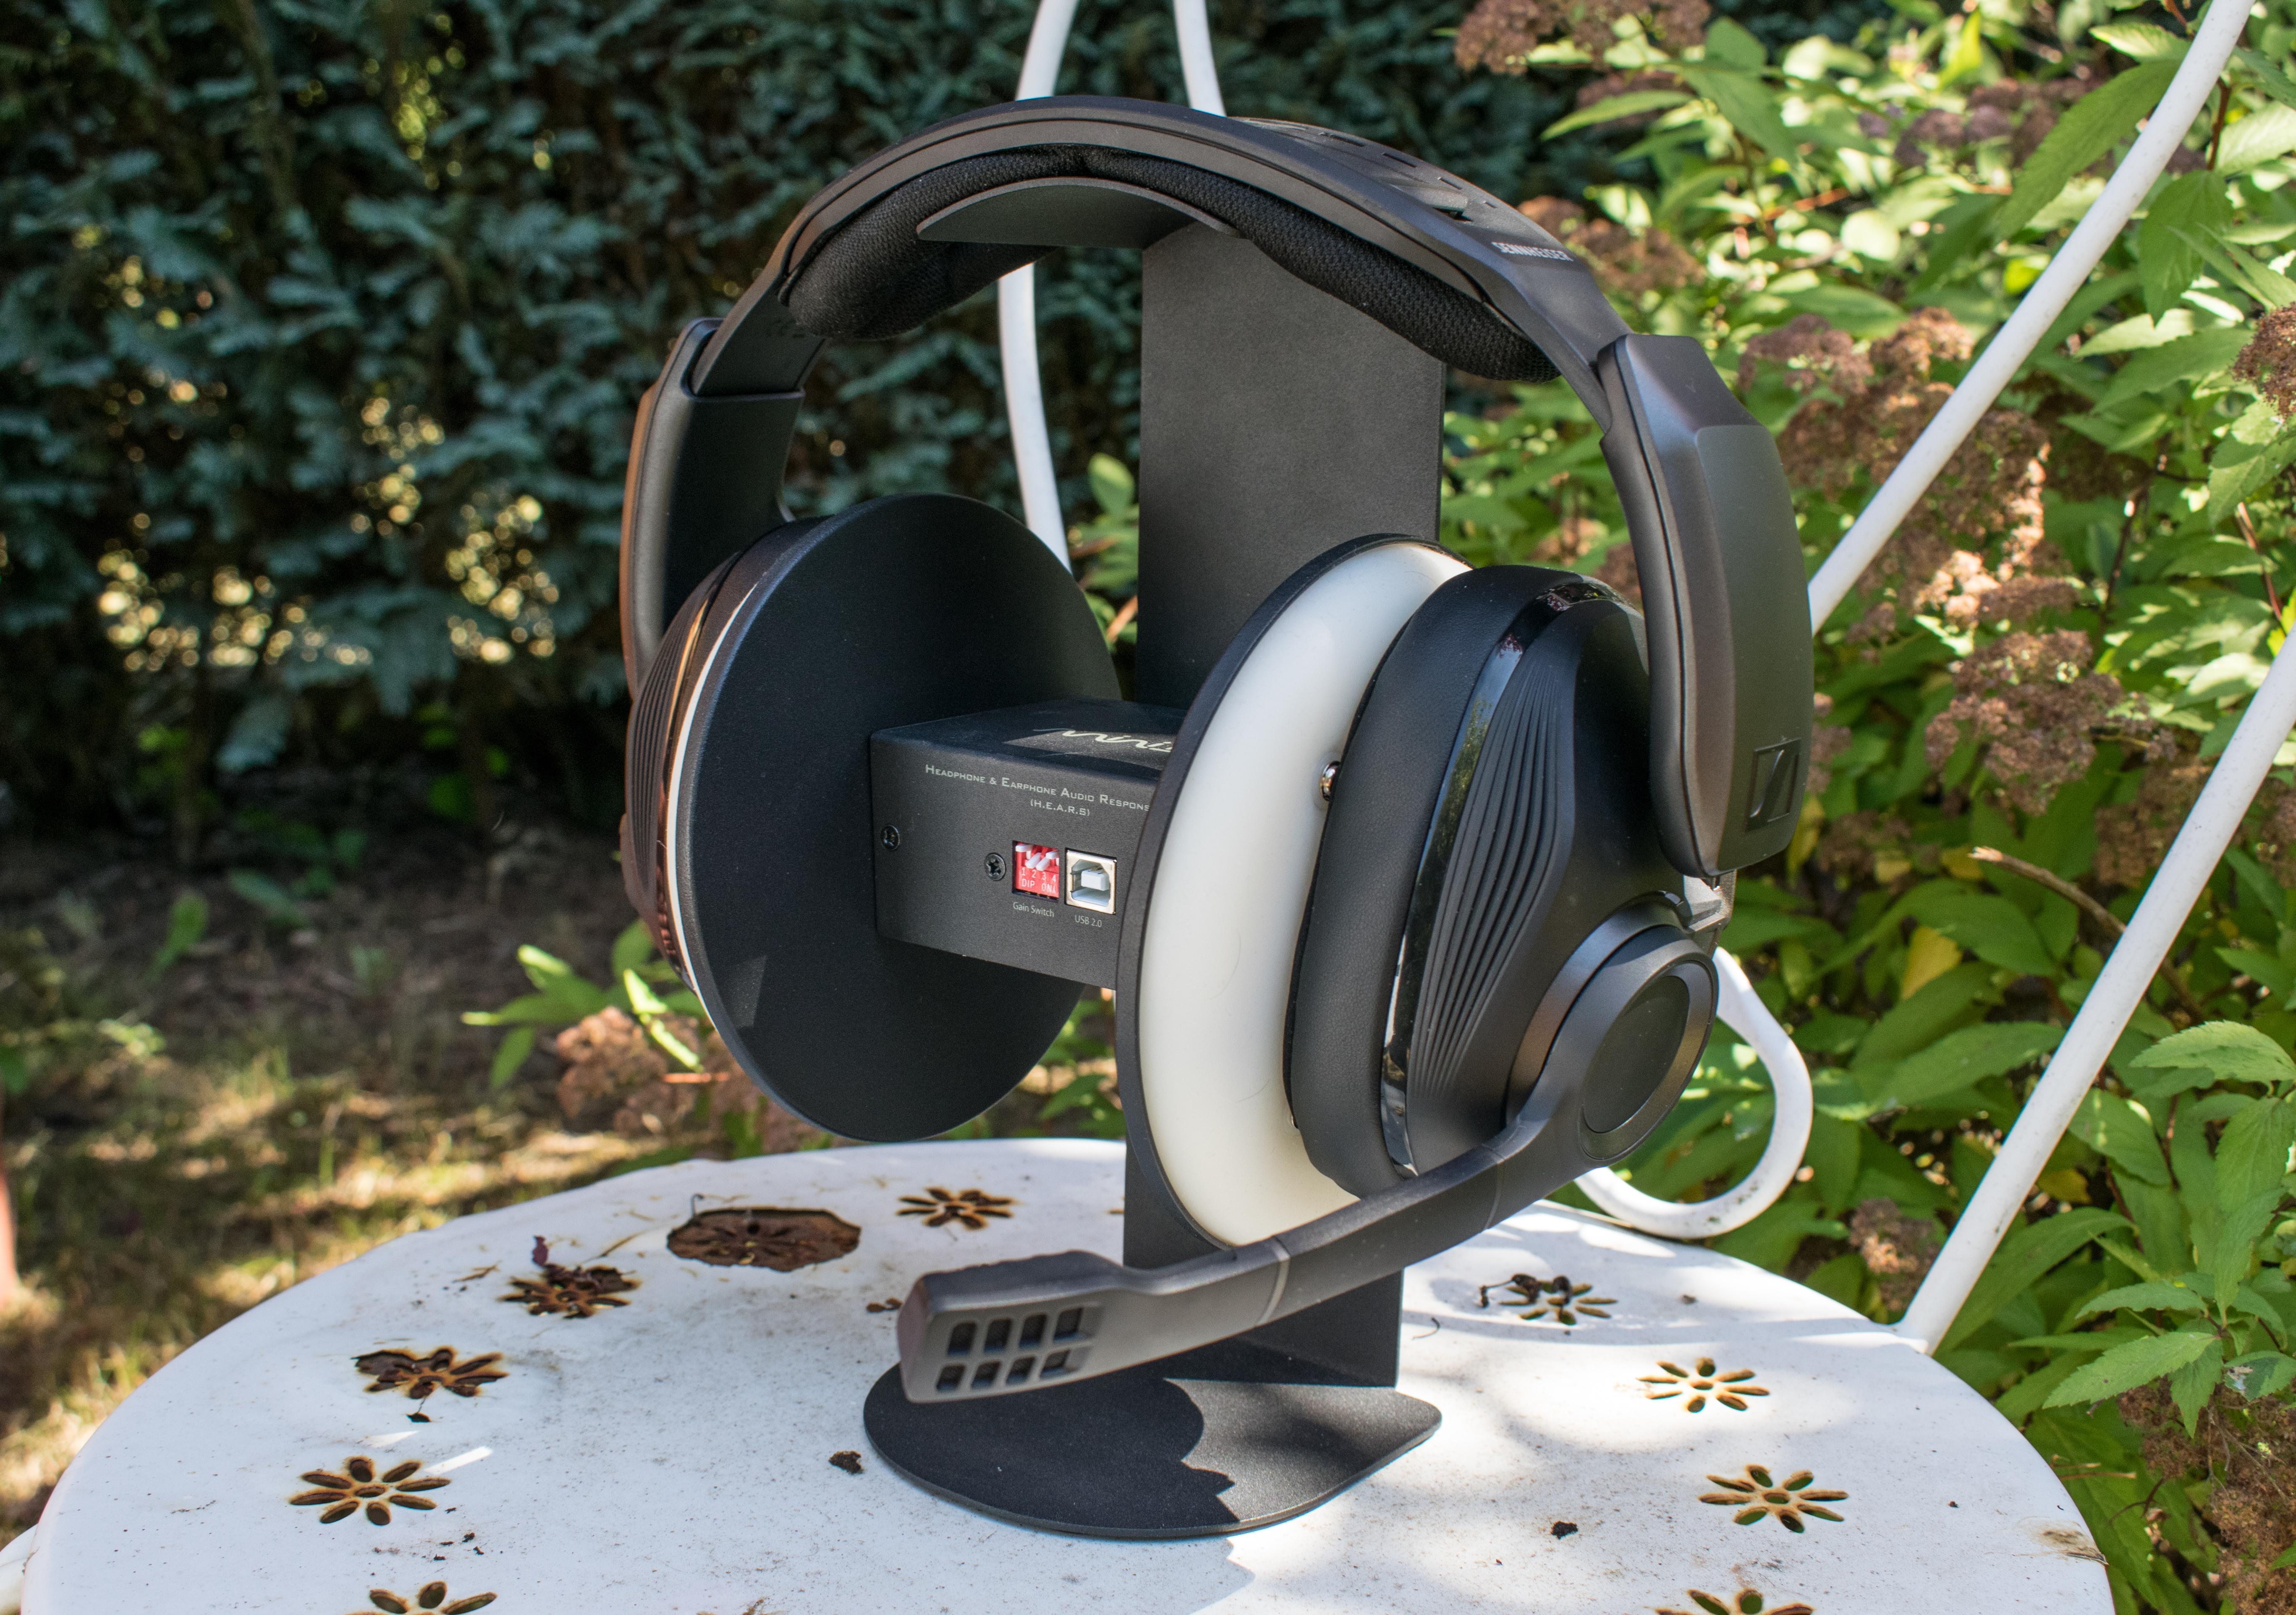 Audio Quality Measurement - The Sennheiser GSP670 Wireless Gaming